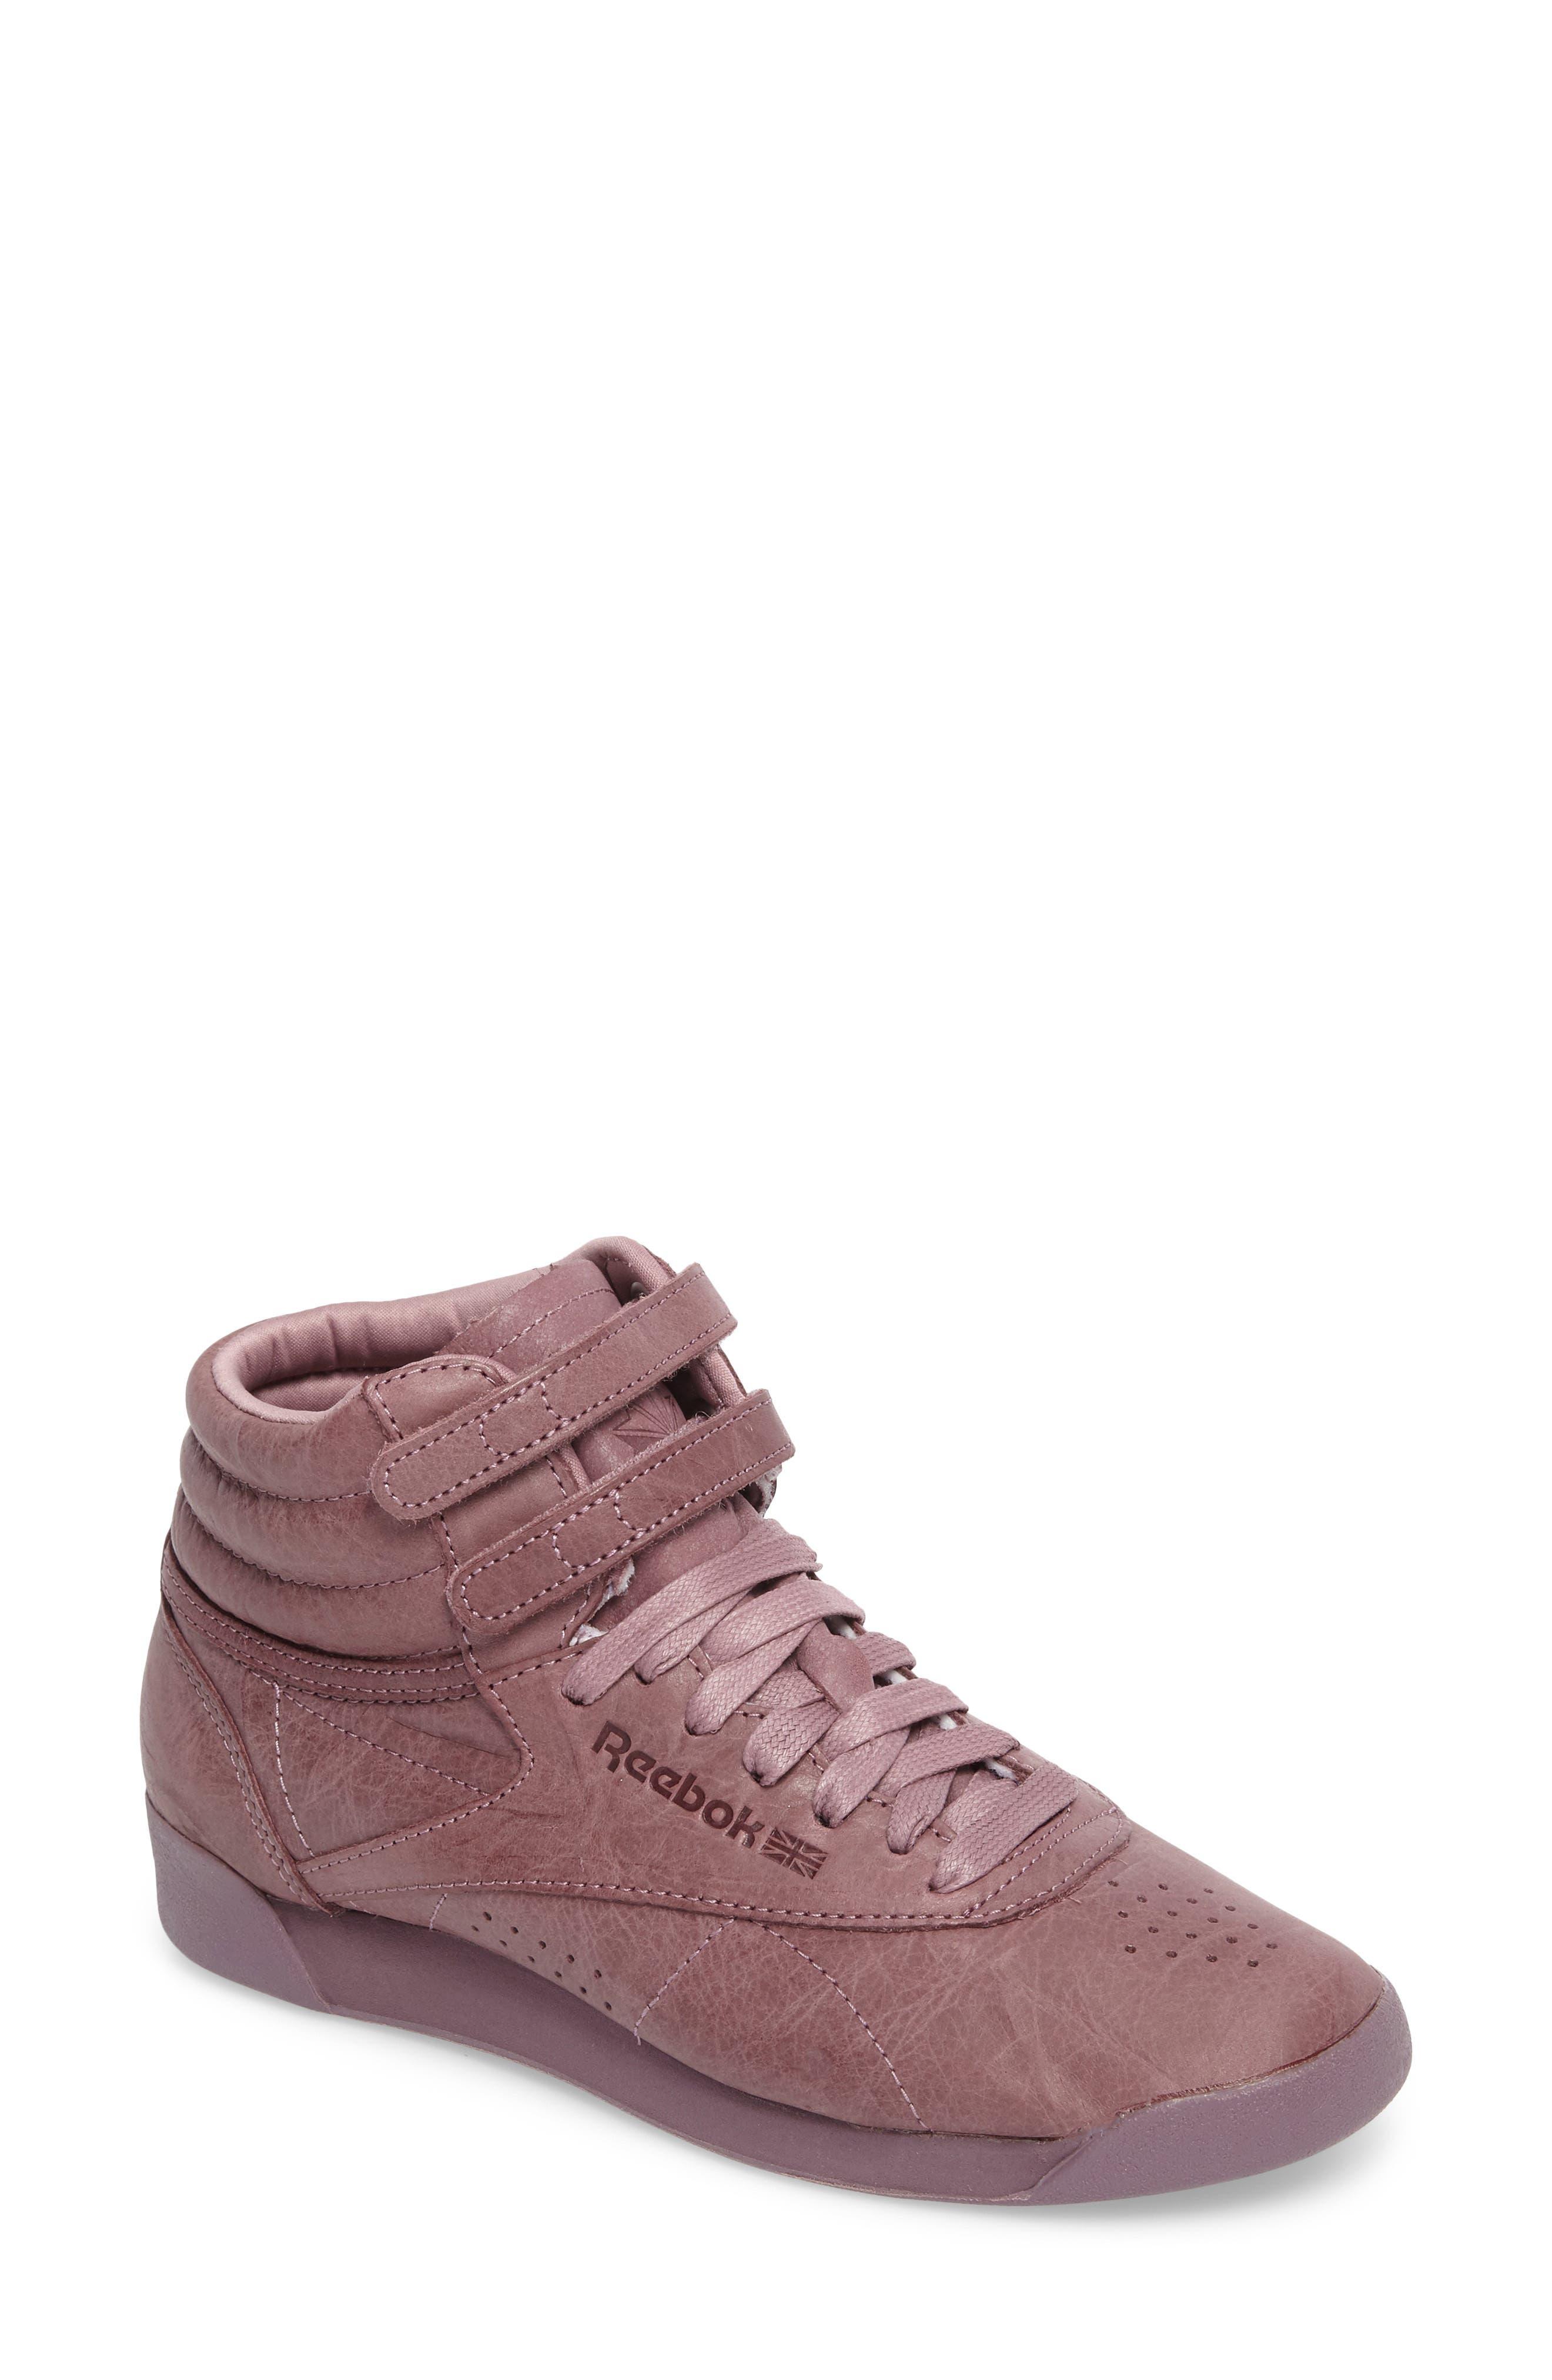 Alternate Image 1 Selected - Reebok Freestyle Hi Sneaker (Women)